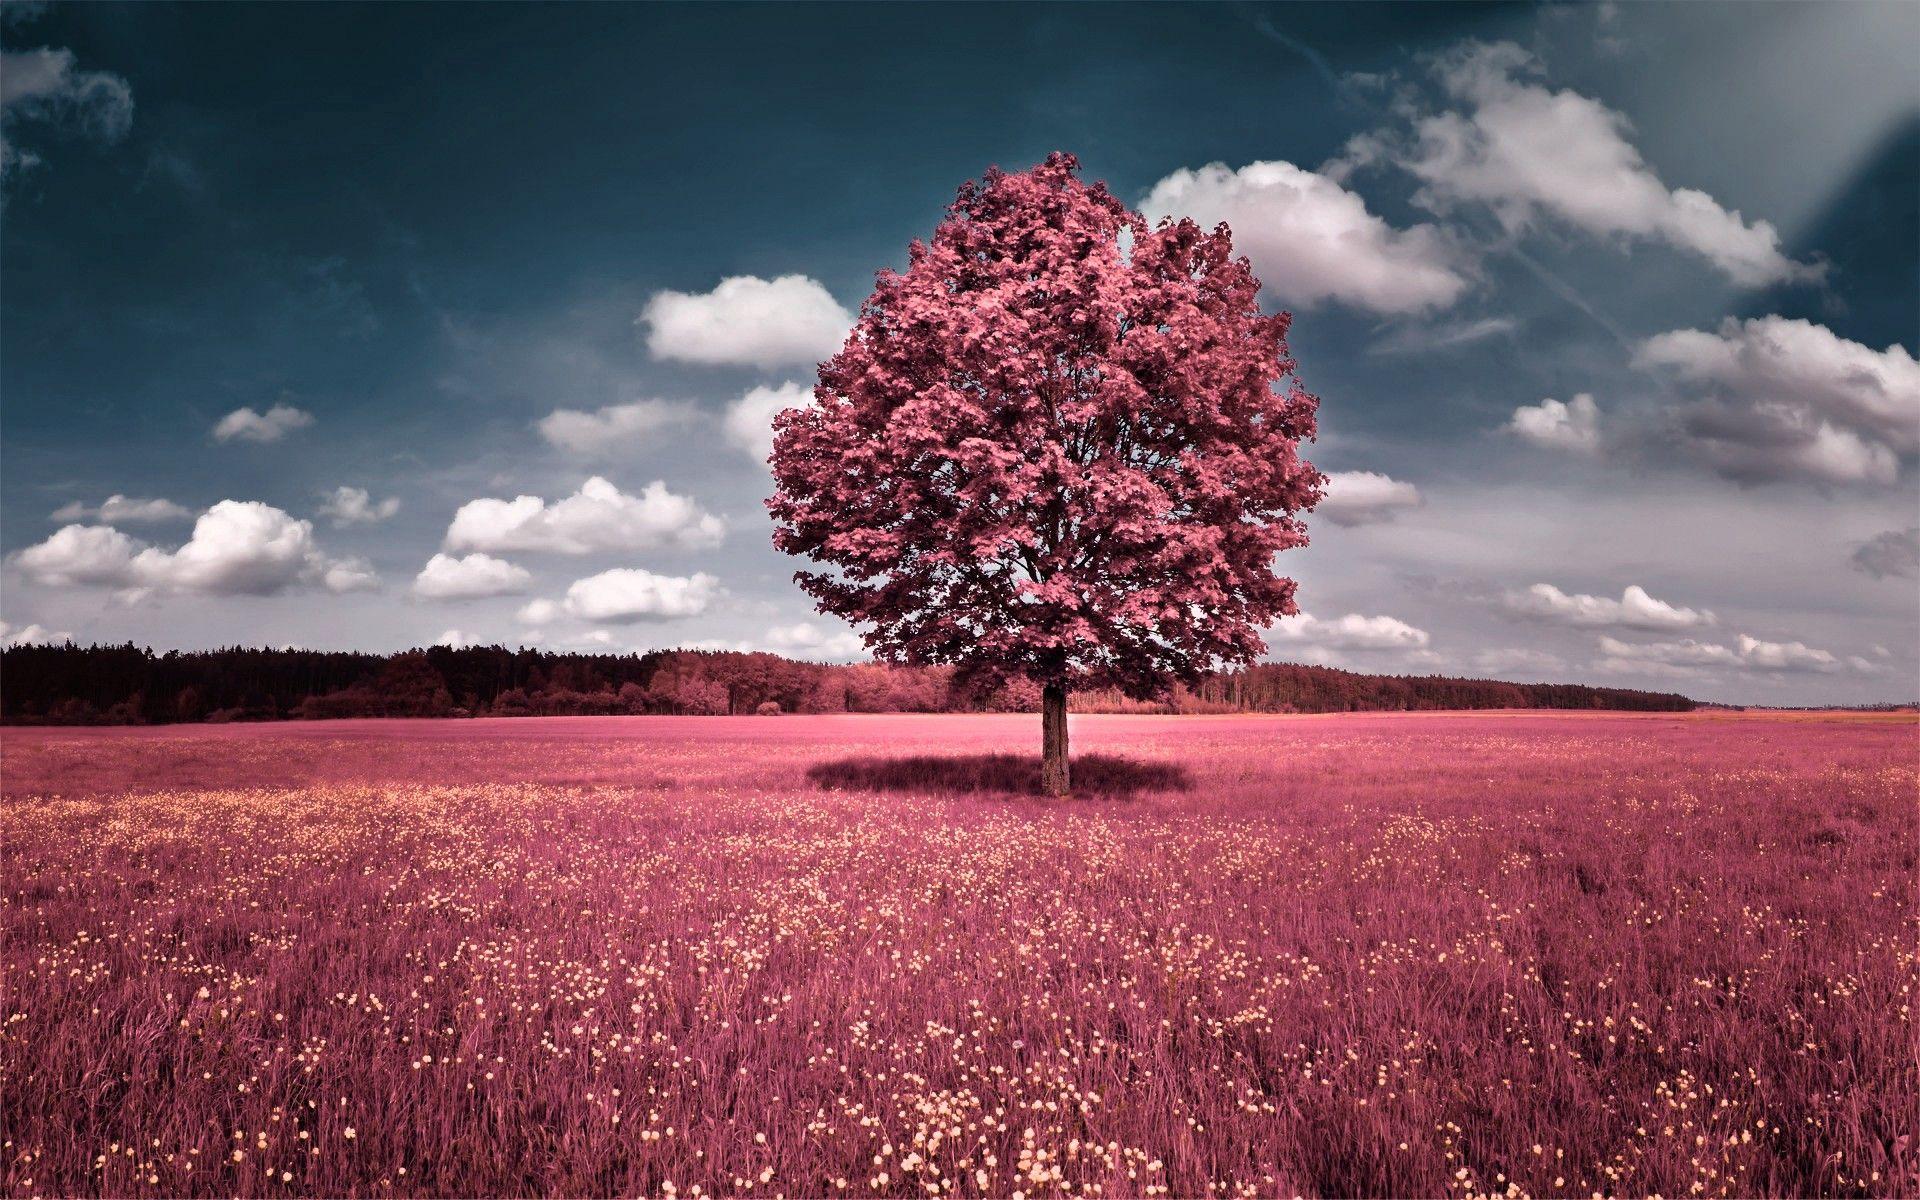 Pink Nature Wallpaper Hd Download